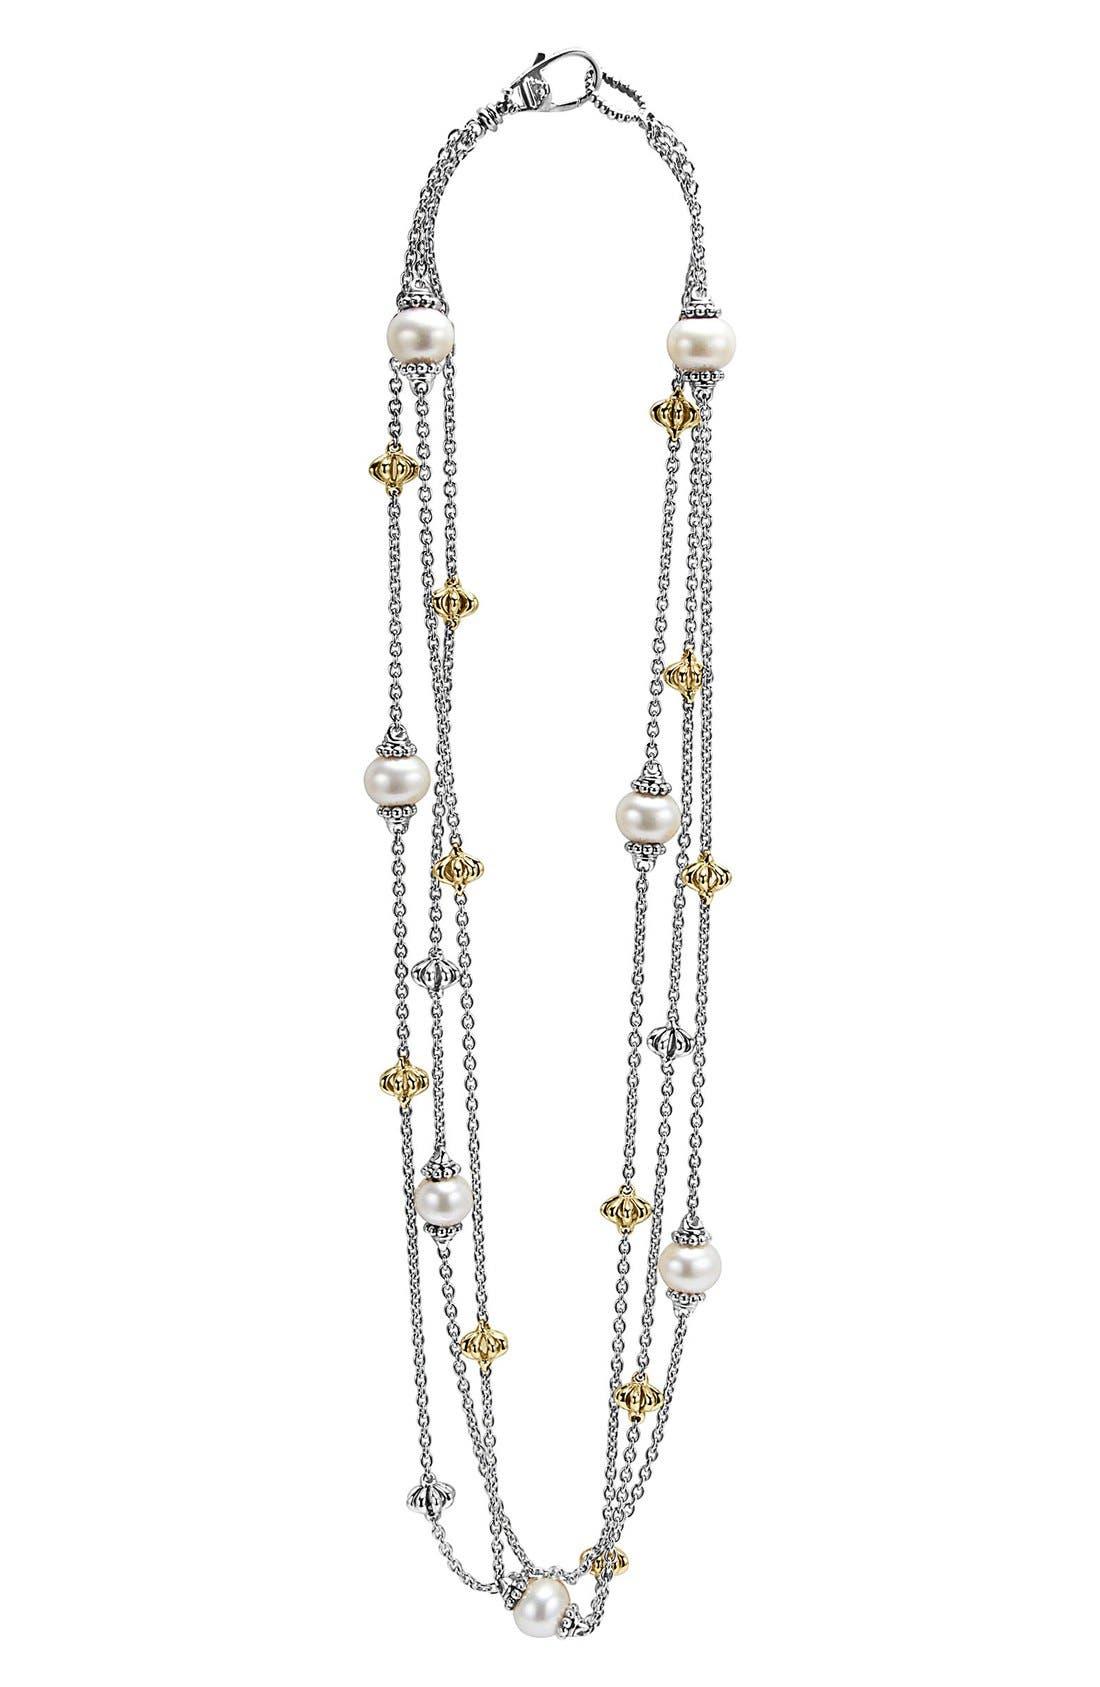 LAGOS Luna Pearl Three-Strand Link Necklace